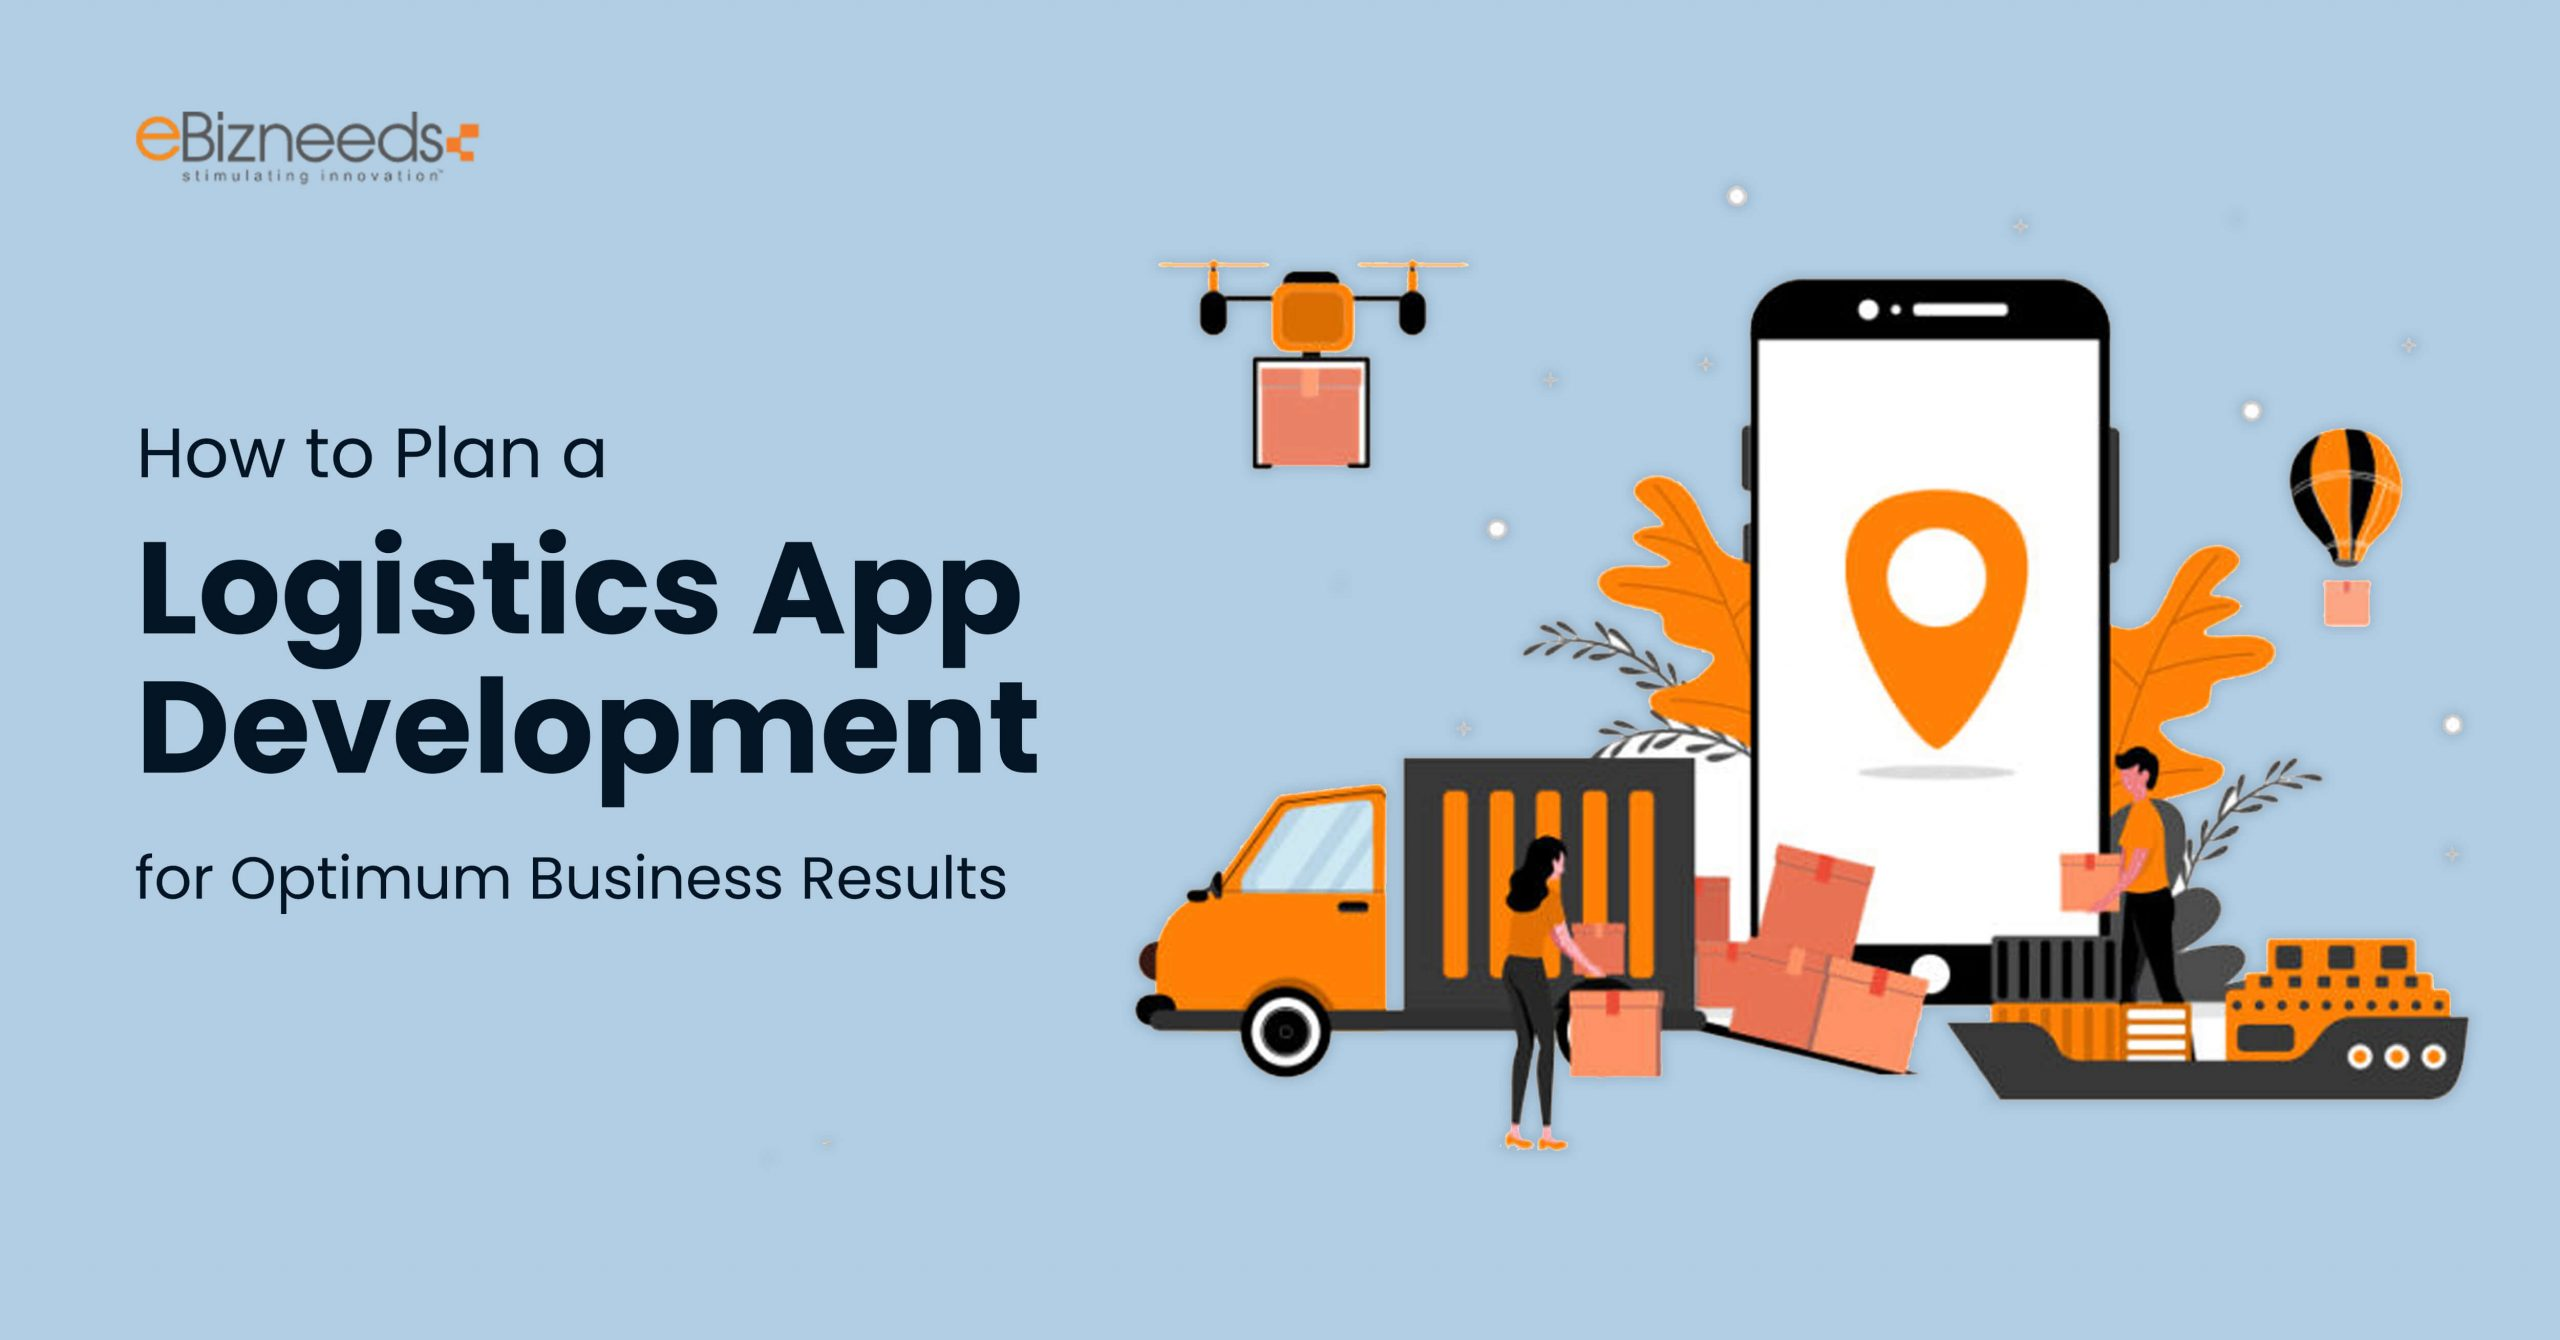 Logistics App Development for Optimum Business Results